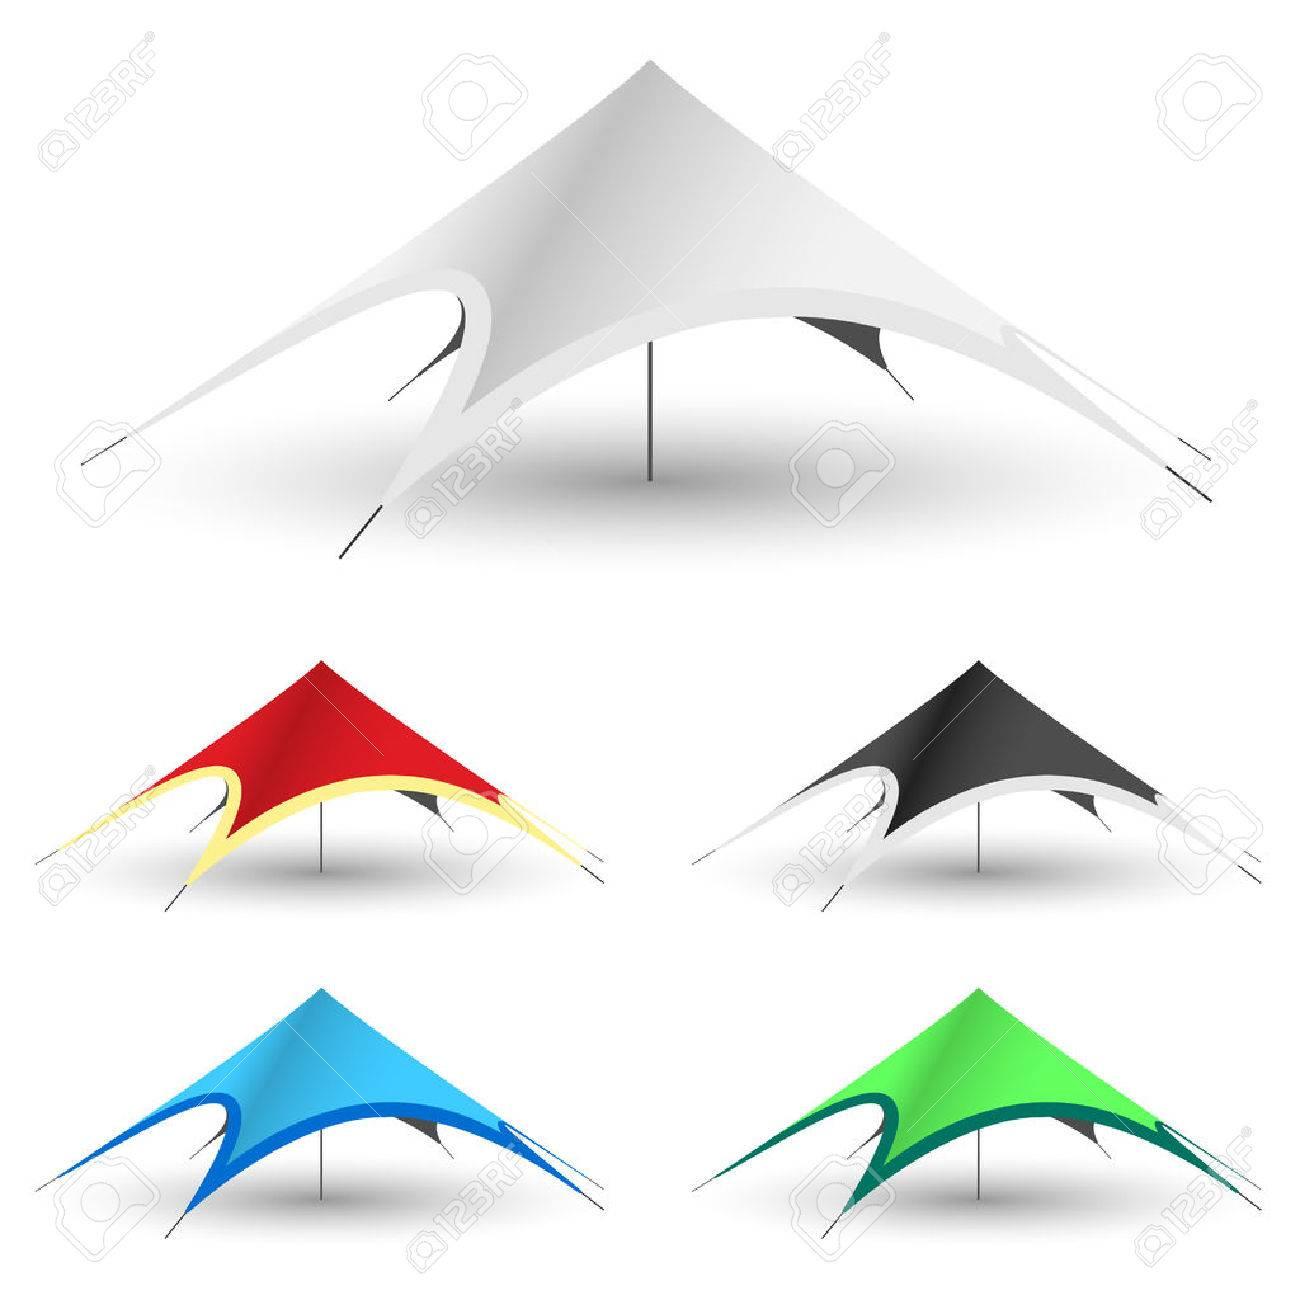 Star Tent on a white background Standard-Bild - 43643020